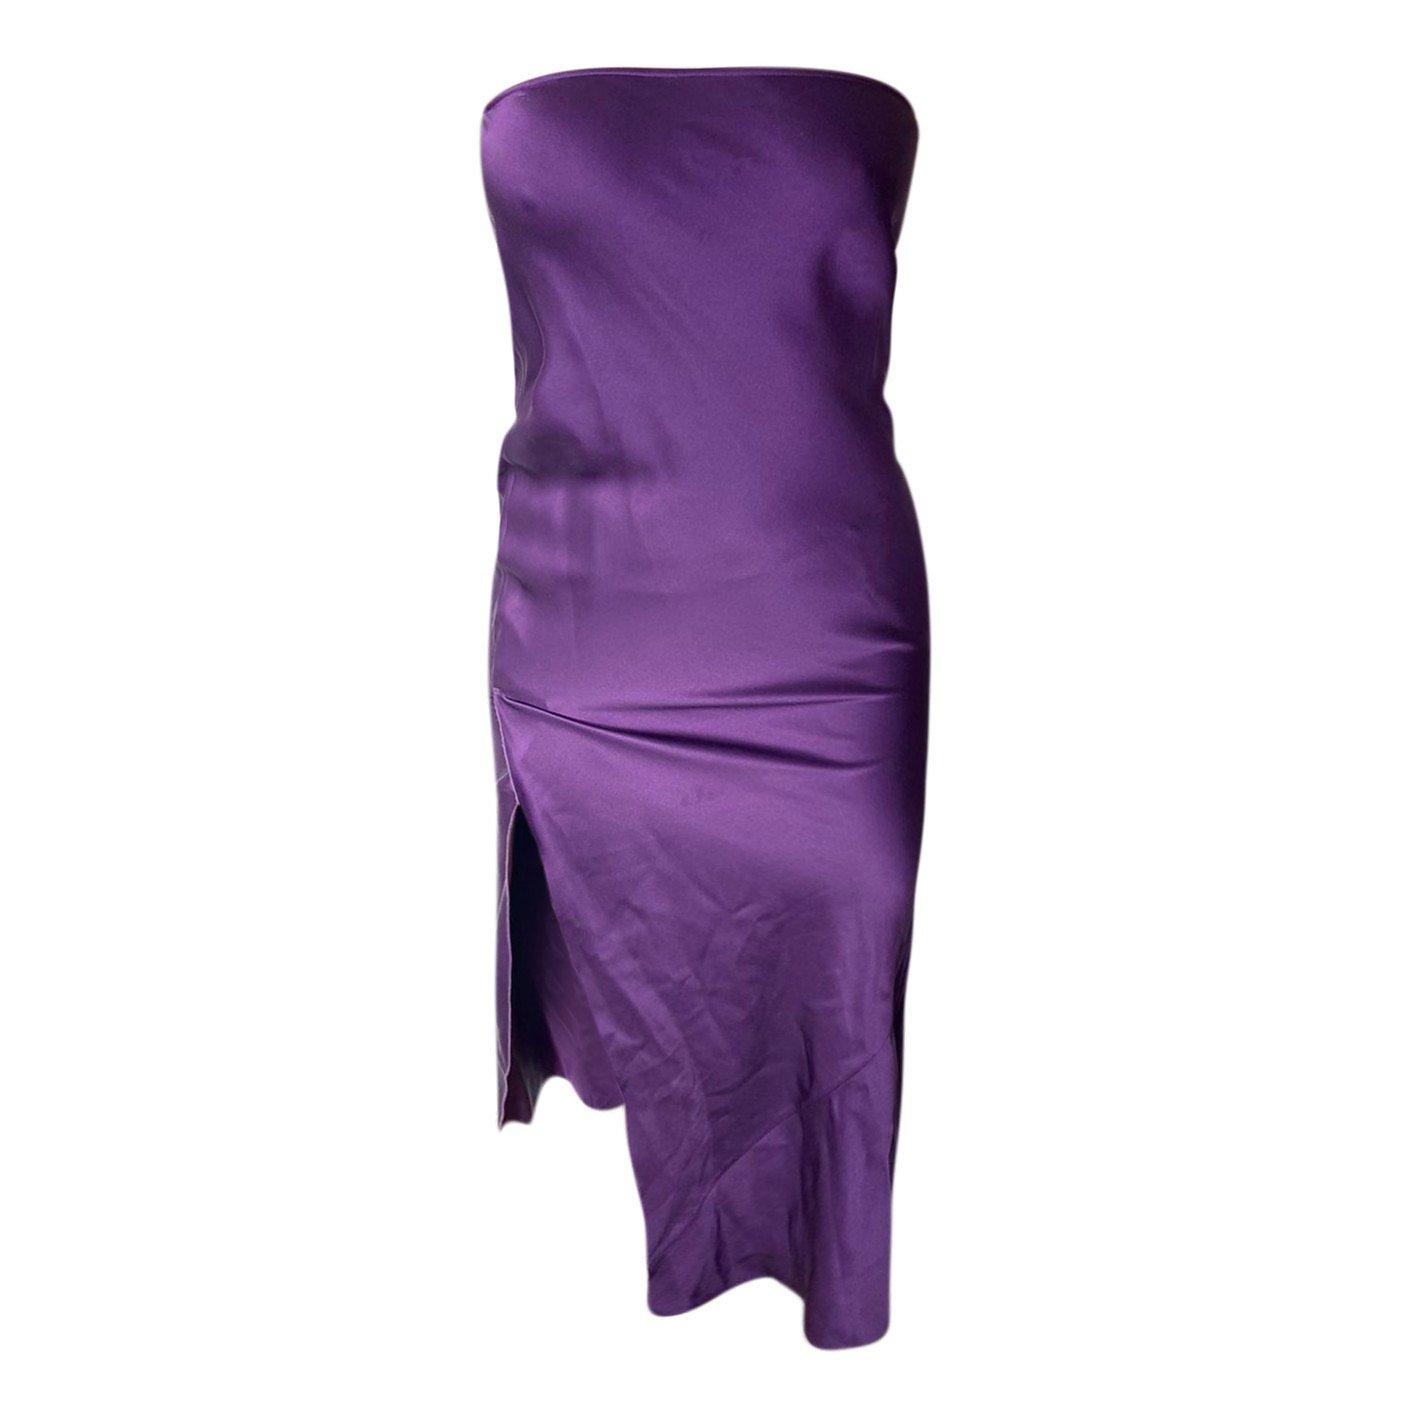 Acne Studios Silk Slip Dress